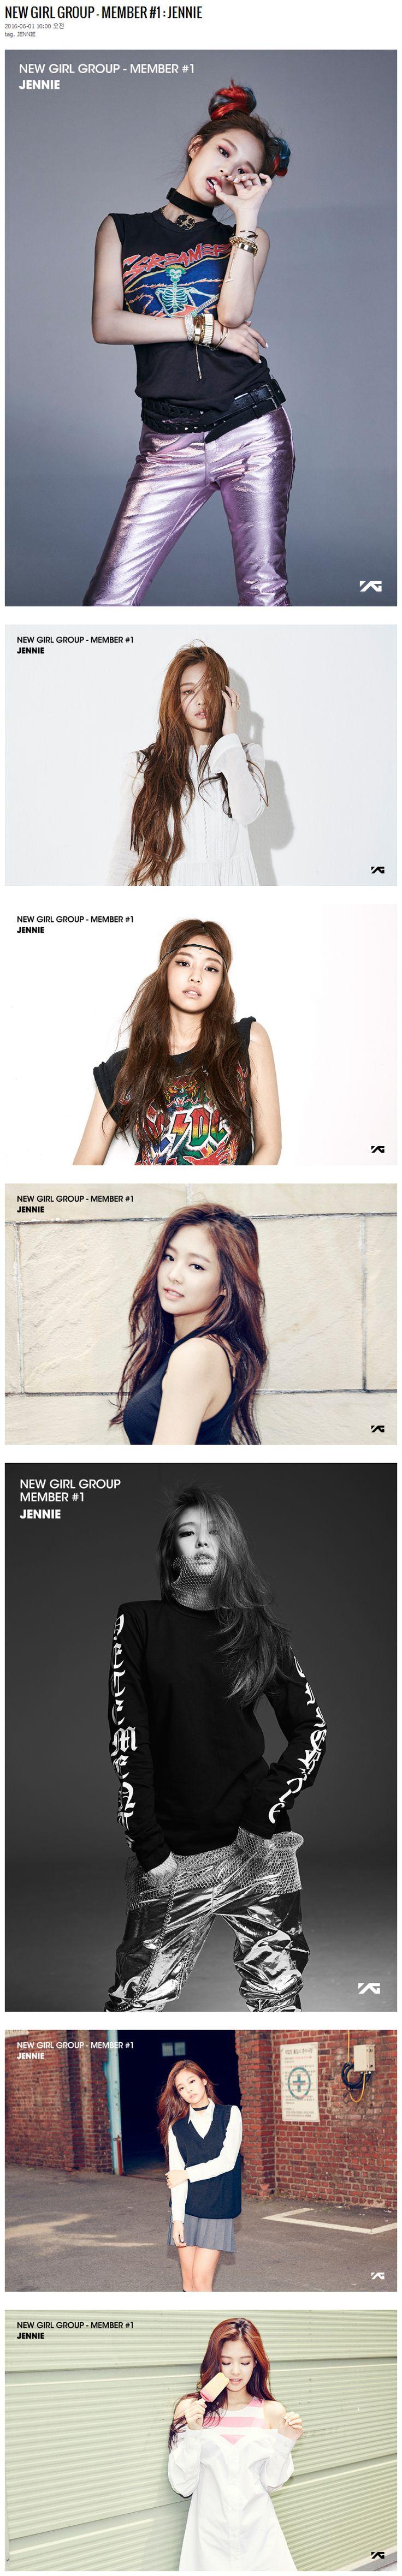 YG LIFE | NEW GIRL GROUP – MEMBER #1 : JENNIE